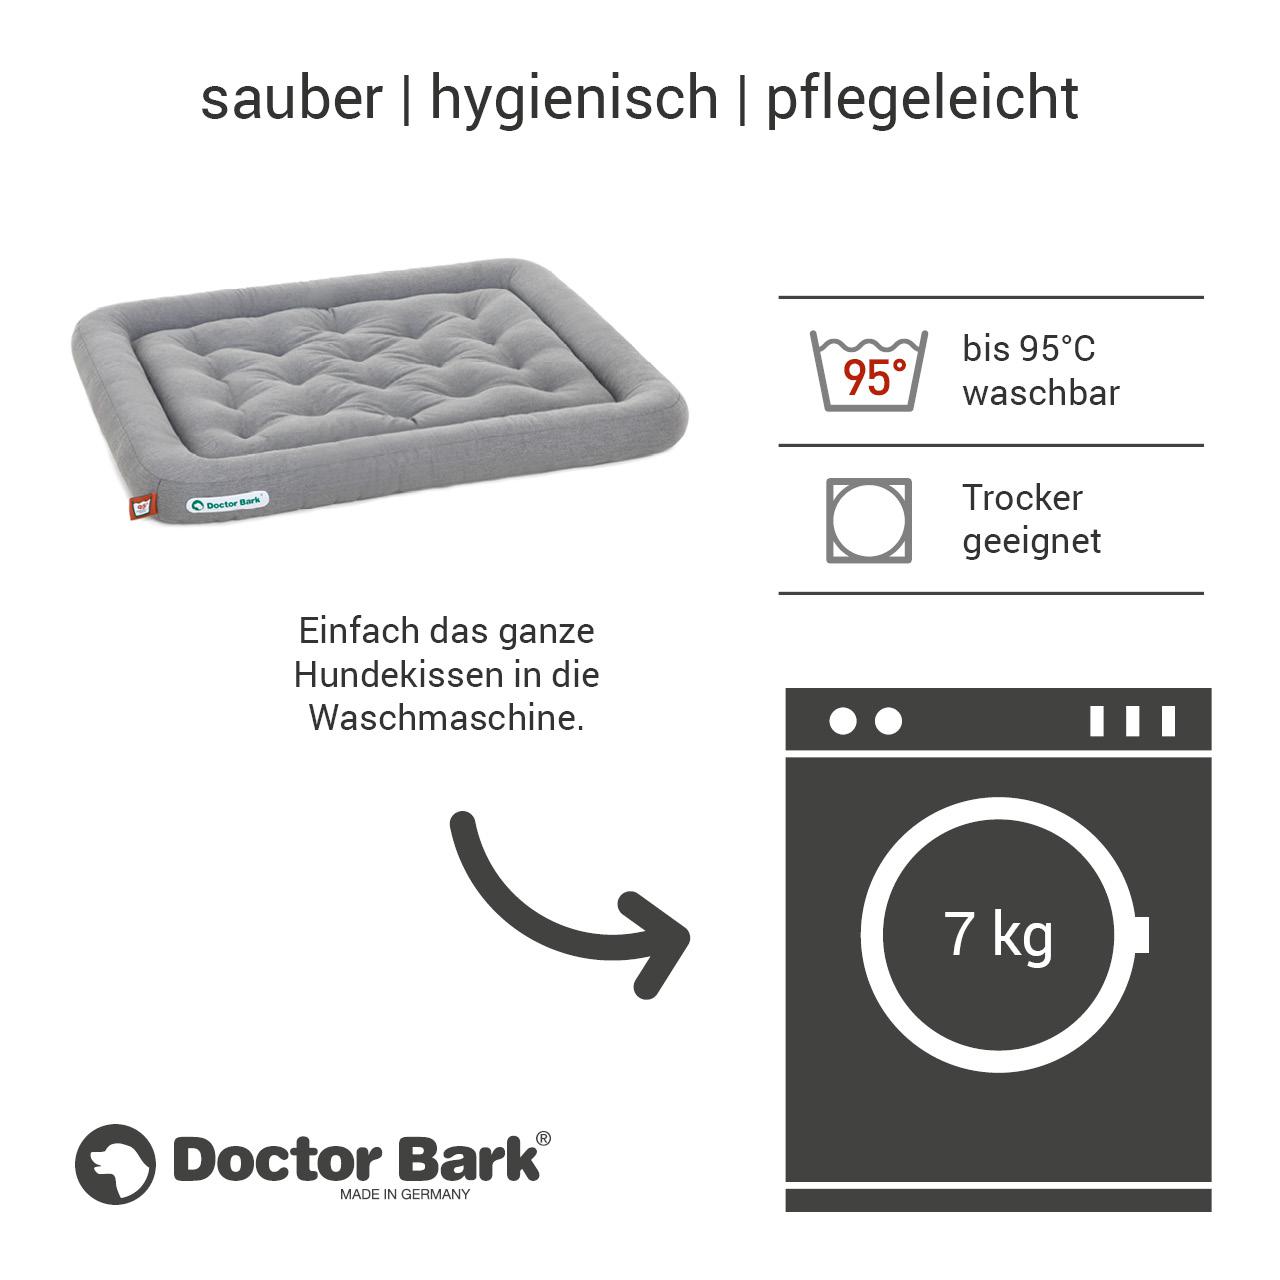 Lounge-Hundekissen / Hundebett orthopädisch Doctor Bark waschbar hellgrau - Gr. L